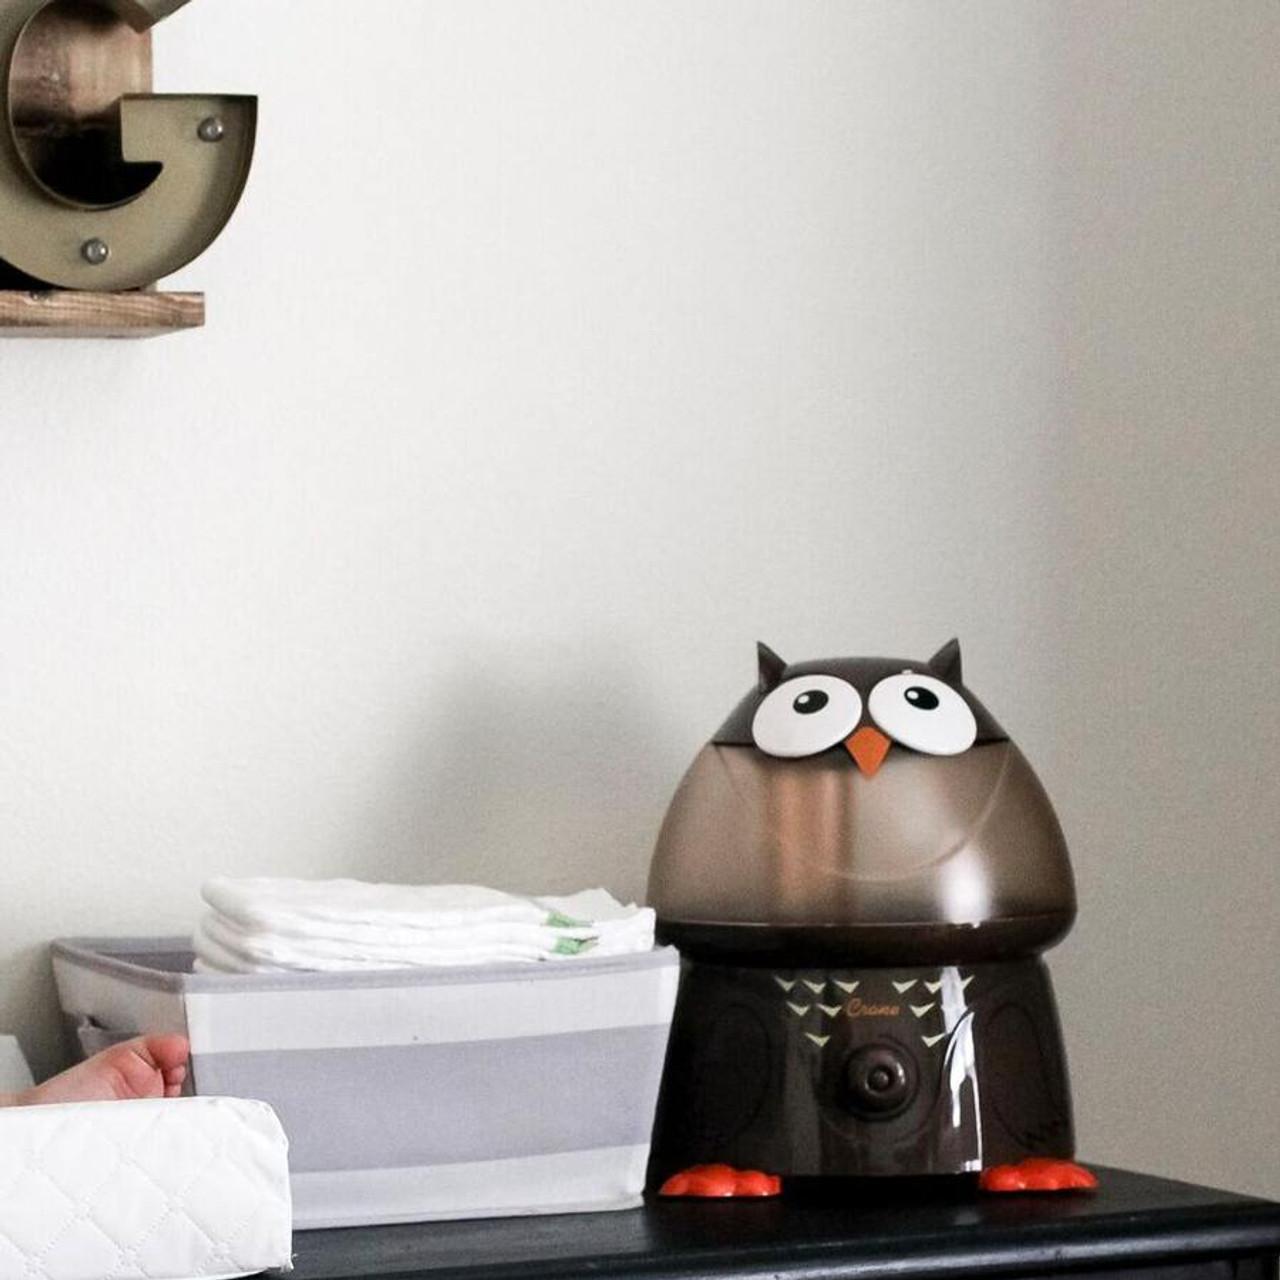 Crane RB-8189 EE-8189 Adorables Ultrasonic Humidifier Owl Certified Refurbished